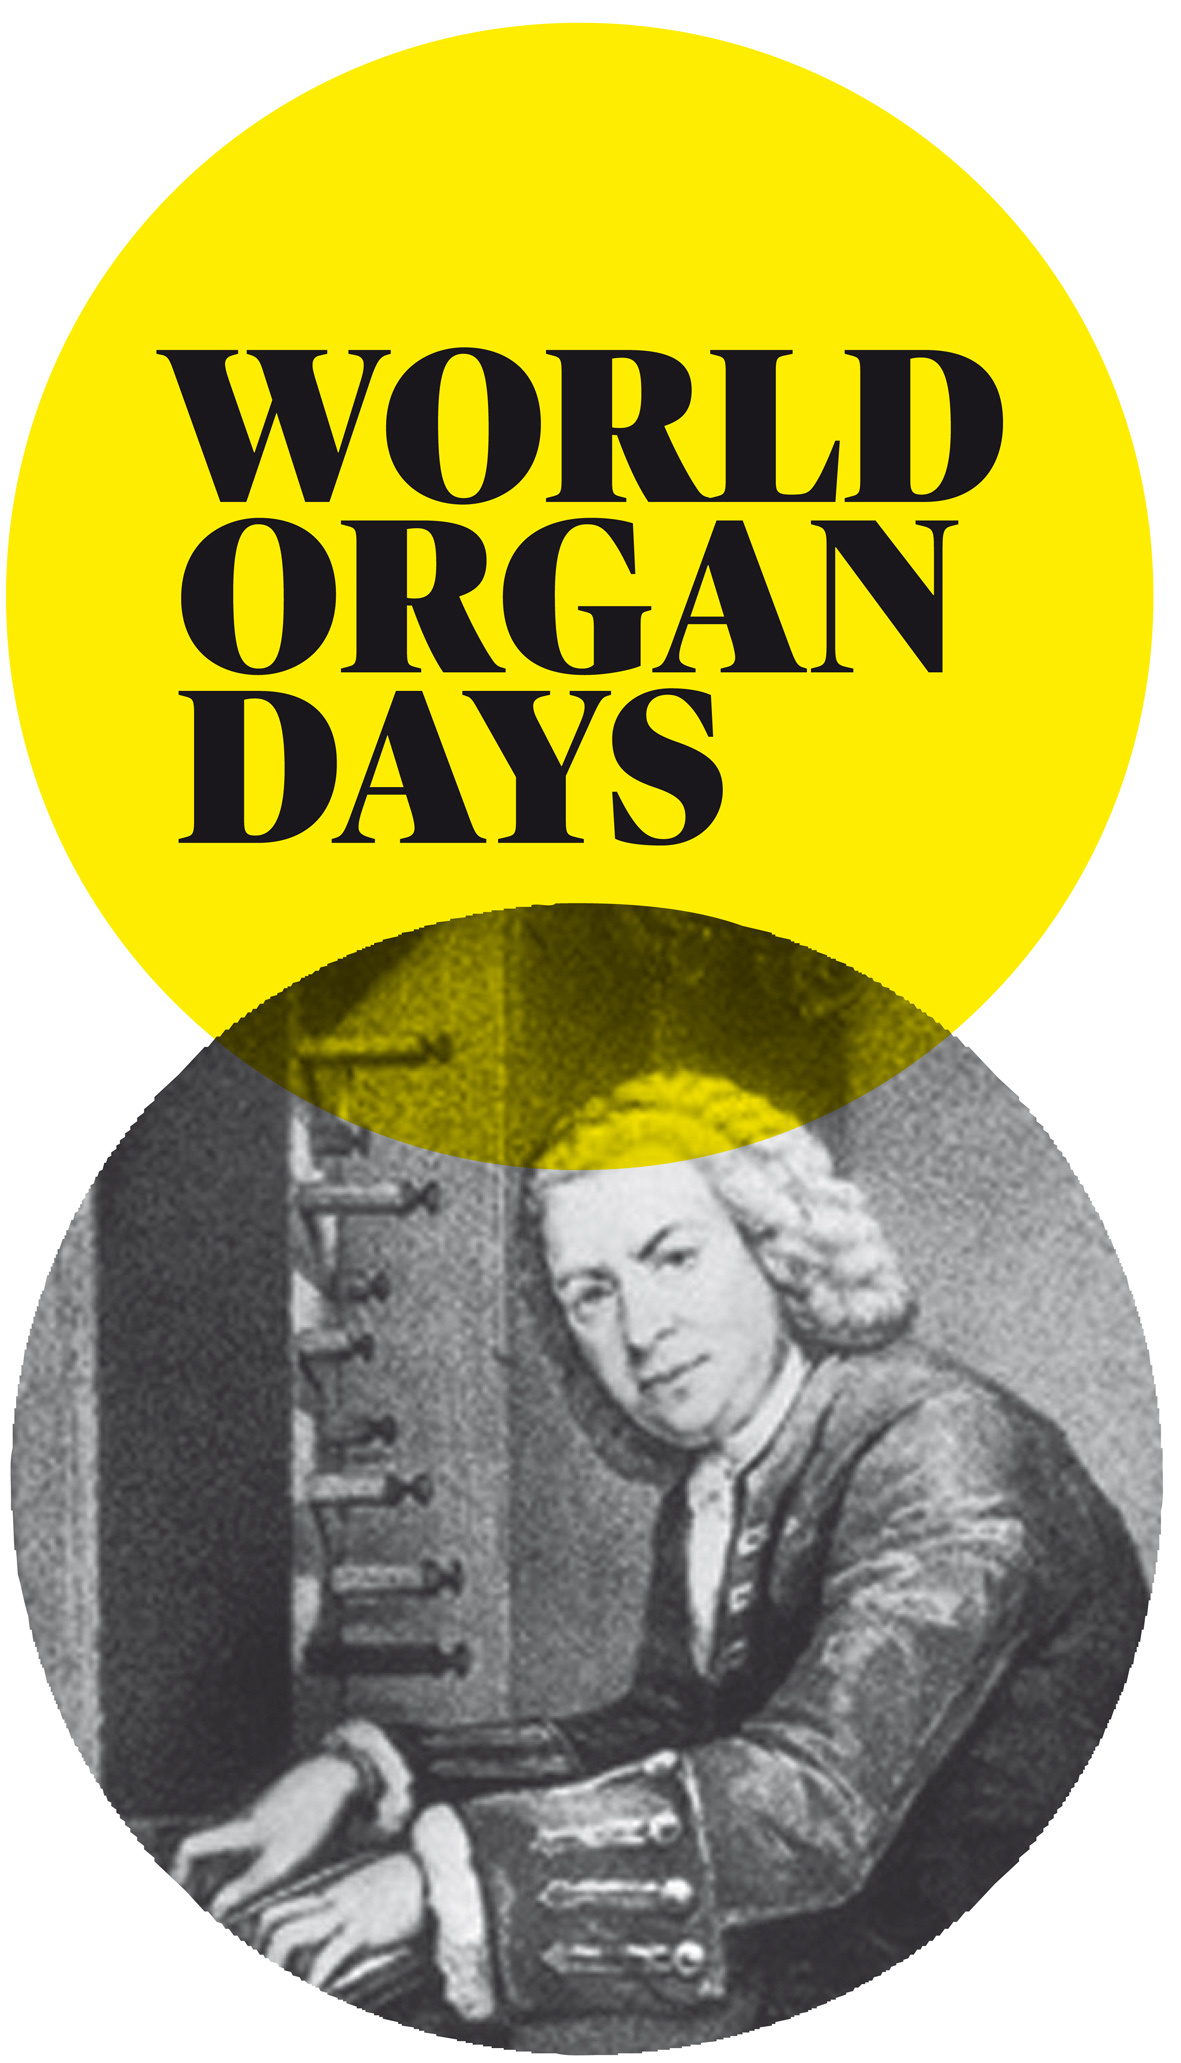 World Organ Days logo